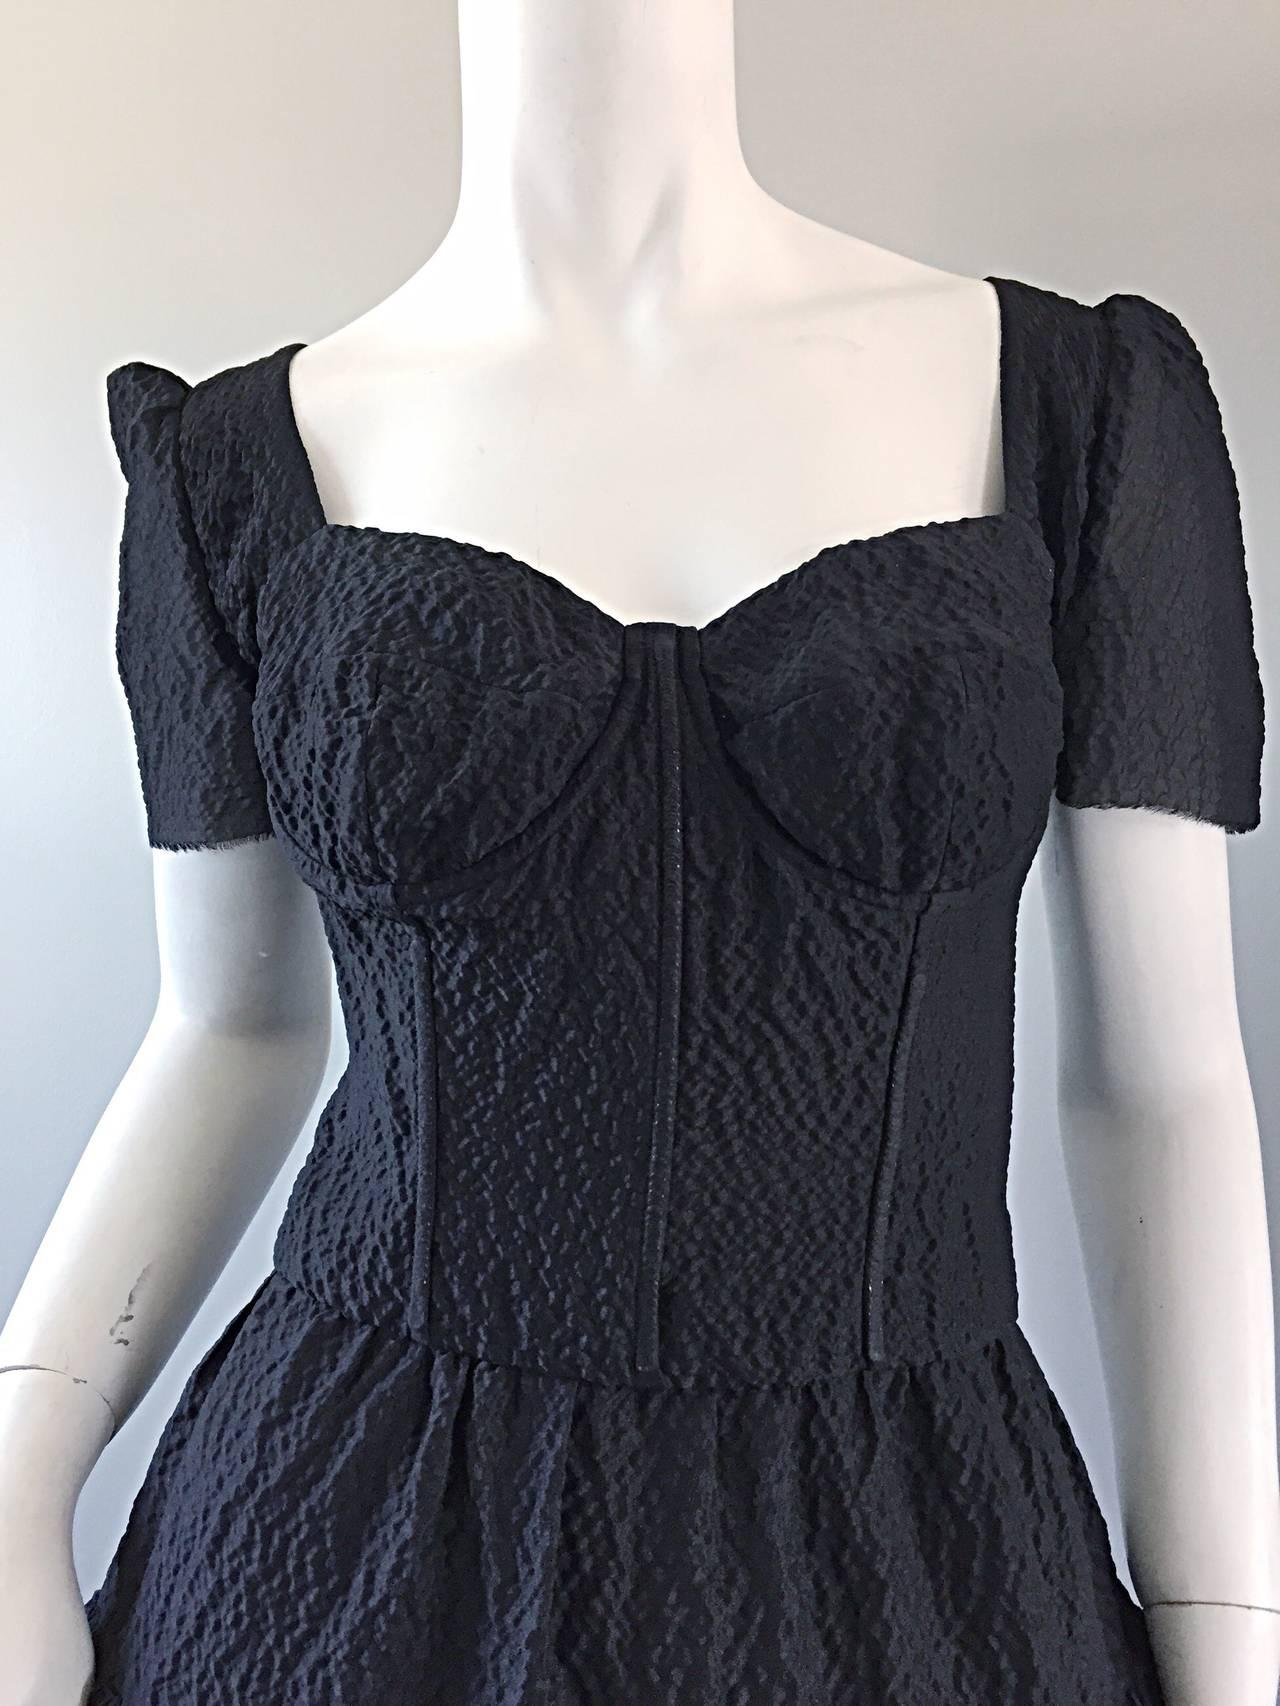 New Dolce And Gabbana Black Silk Bustier Runway Dress From